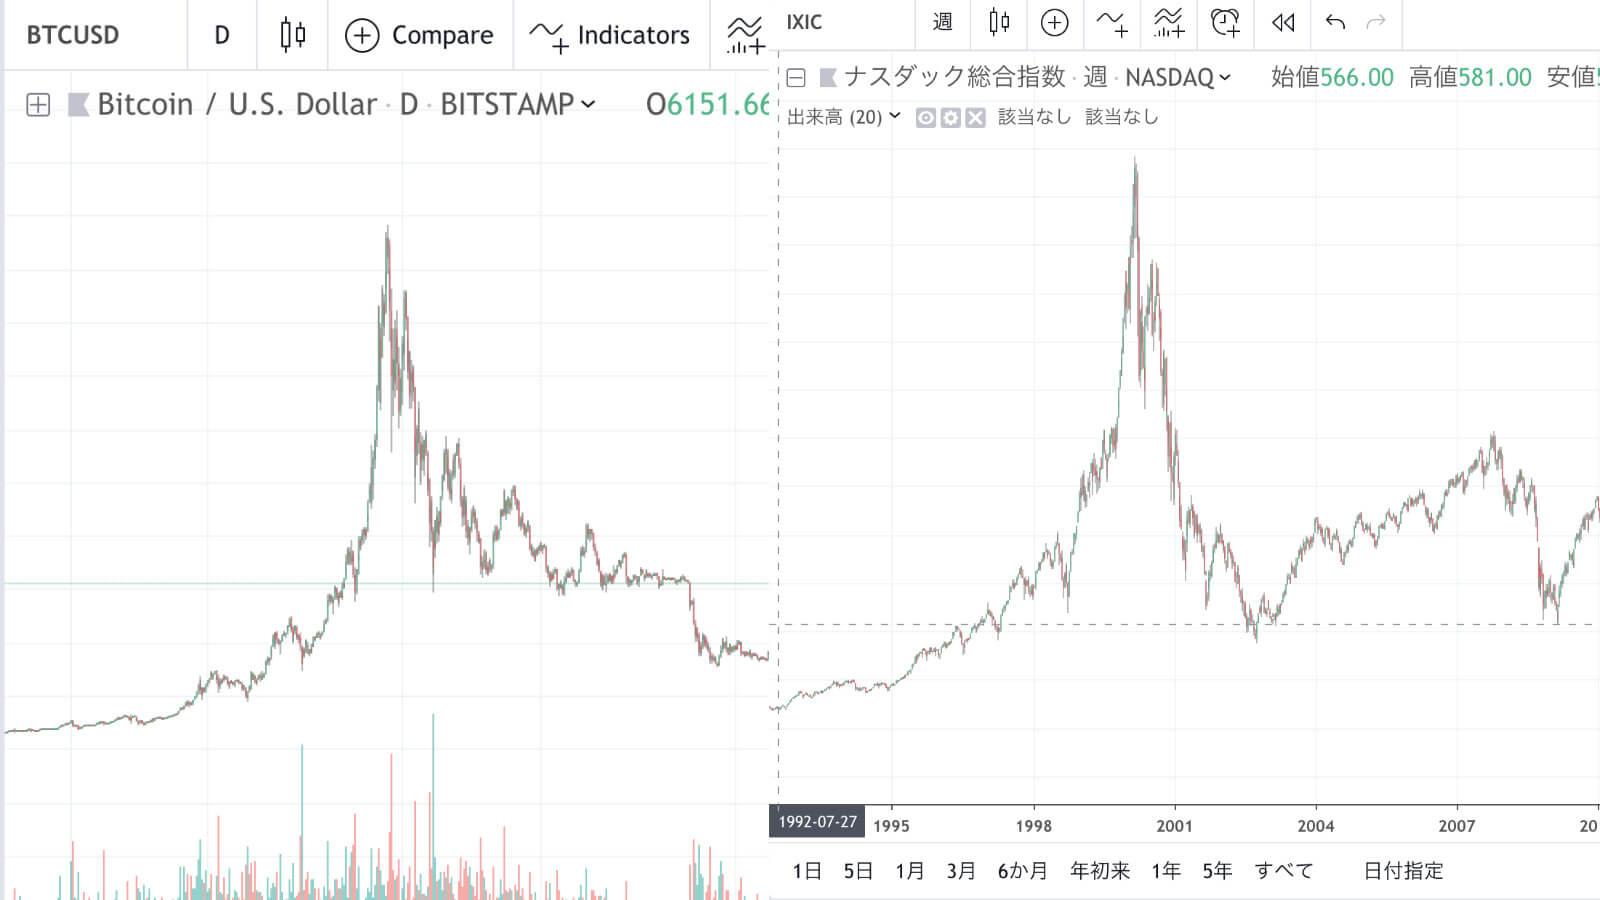 BTCの「日足」とNASDAQの「週足」の近似を表す図